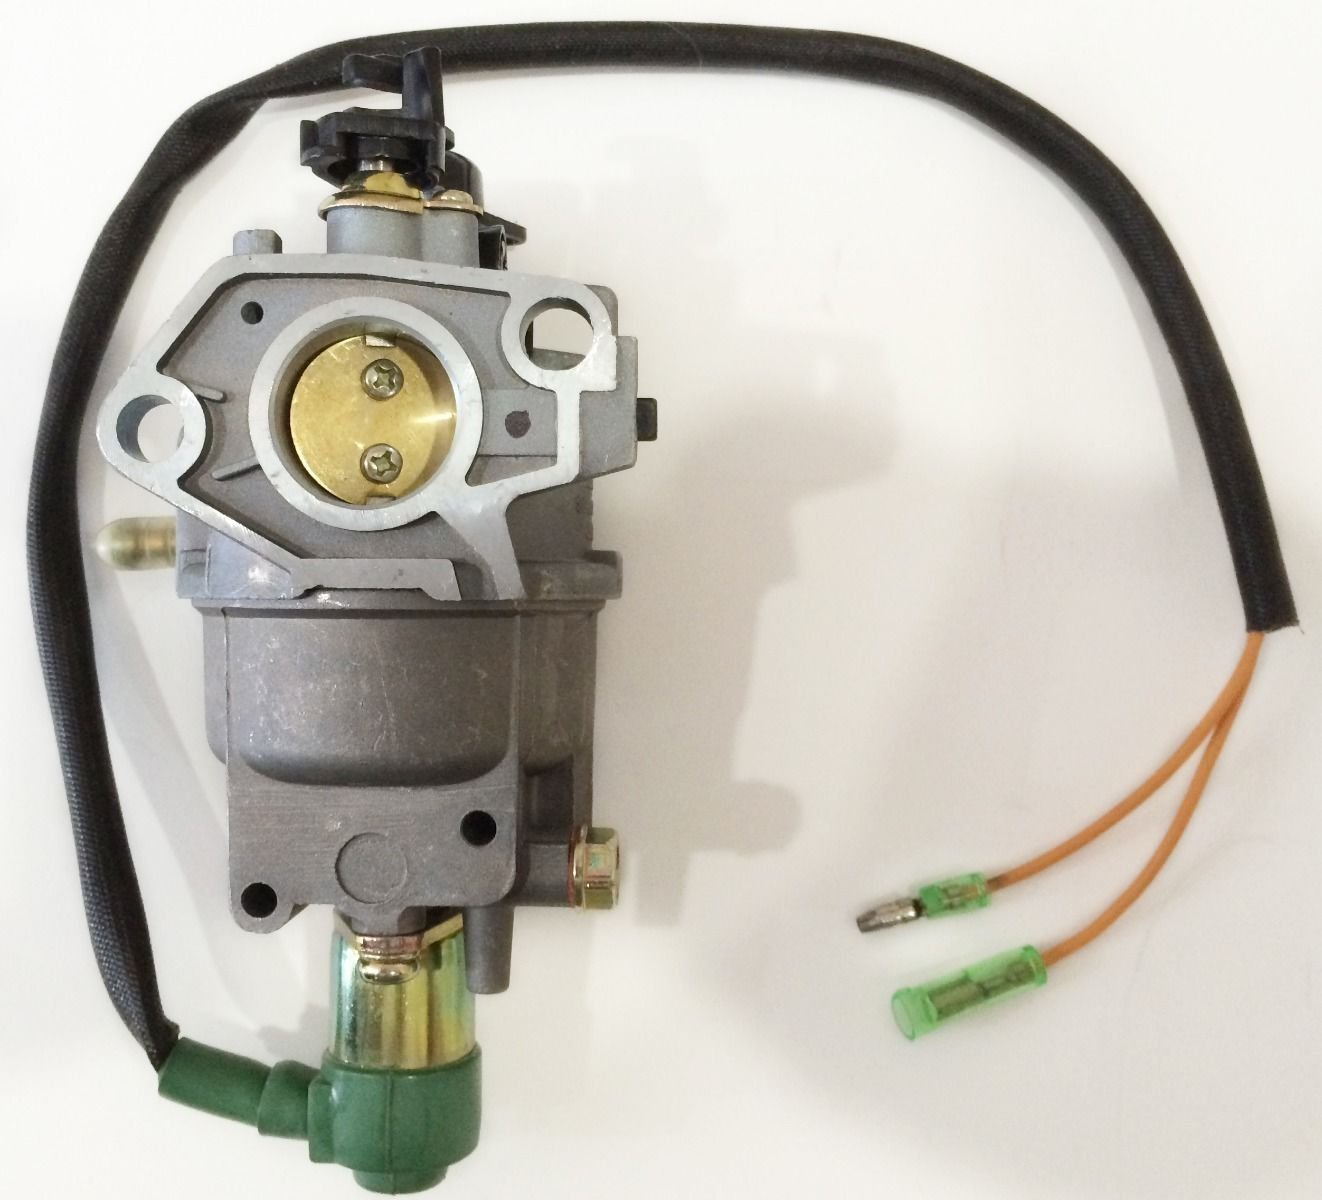 Harbor Freight Predator Generator 420cc 13hp 69671 Raven 4400 Wiring Diagram 68530 68525 8750w Carburetor Garden Outdoor